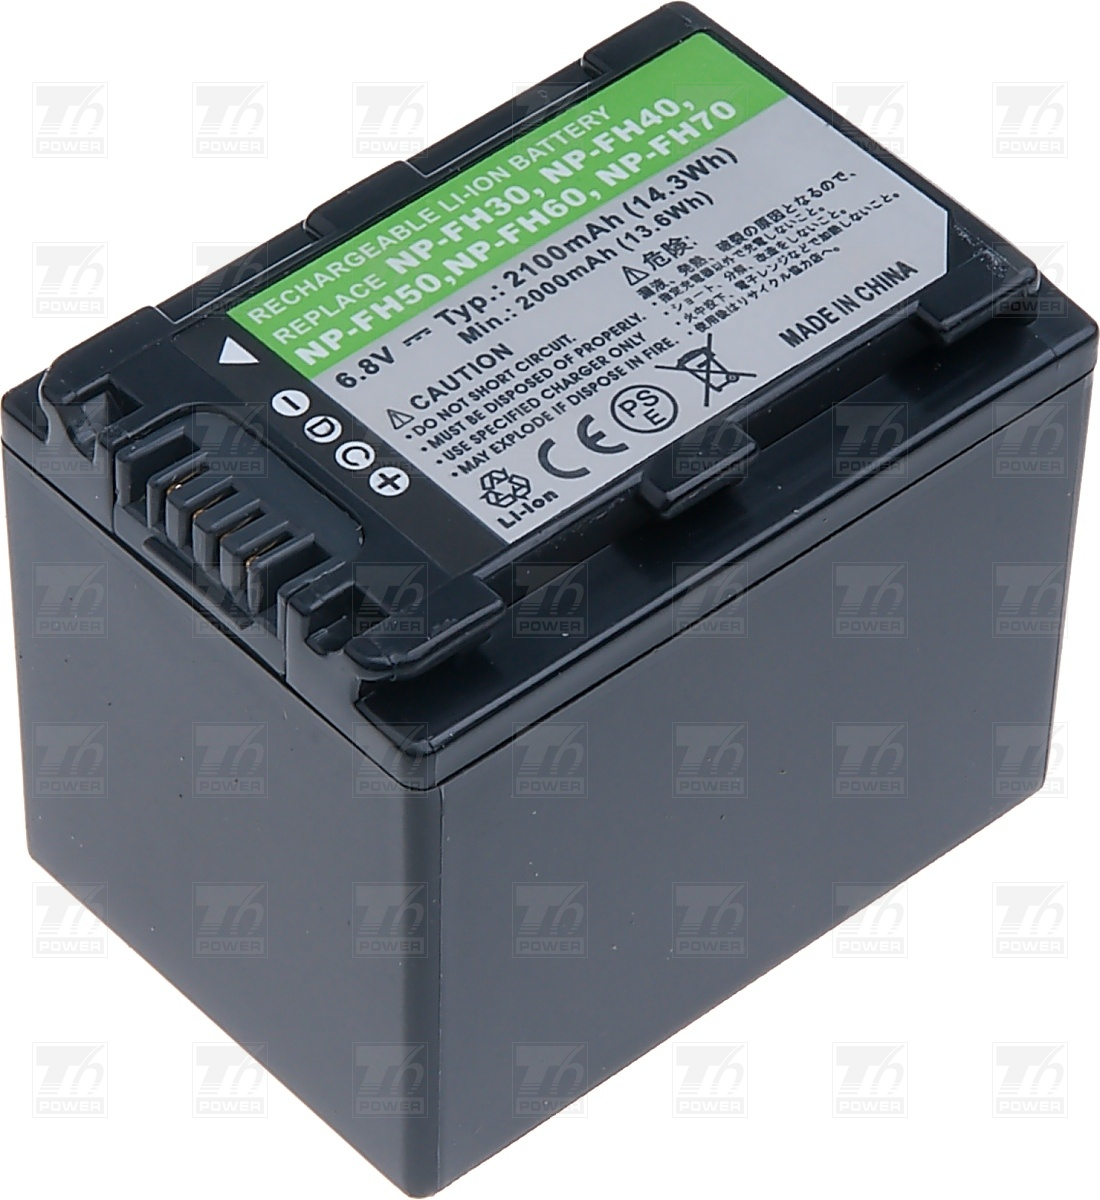 T6 power Baterie T6 power NP-FH30, NP-FH40, NP-FH50, NP-FH60, NP